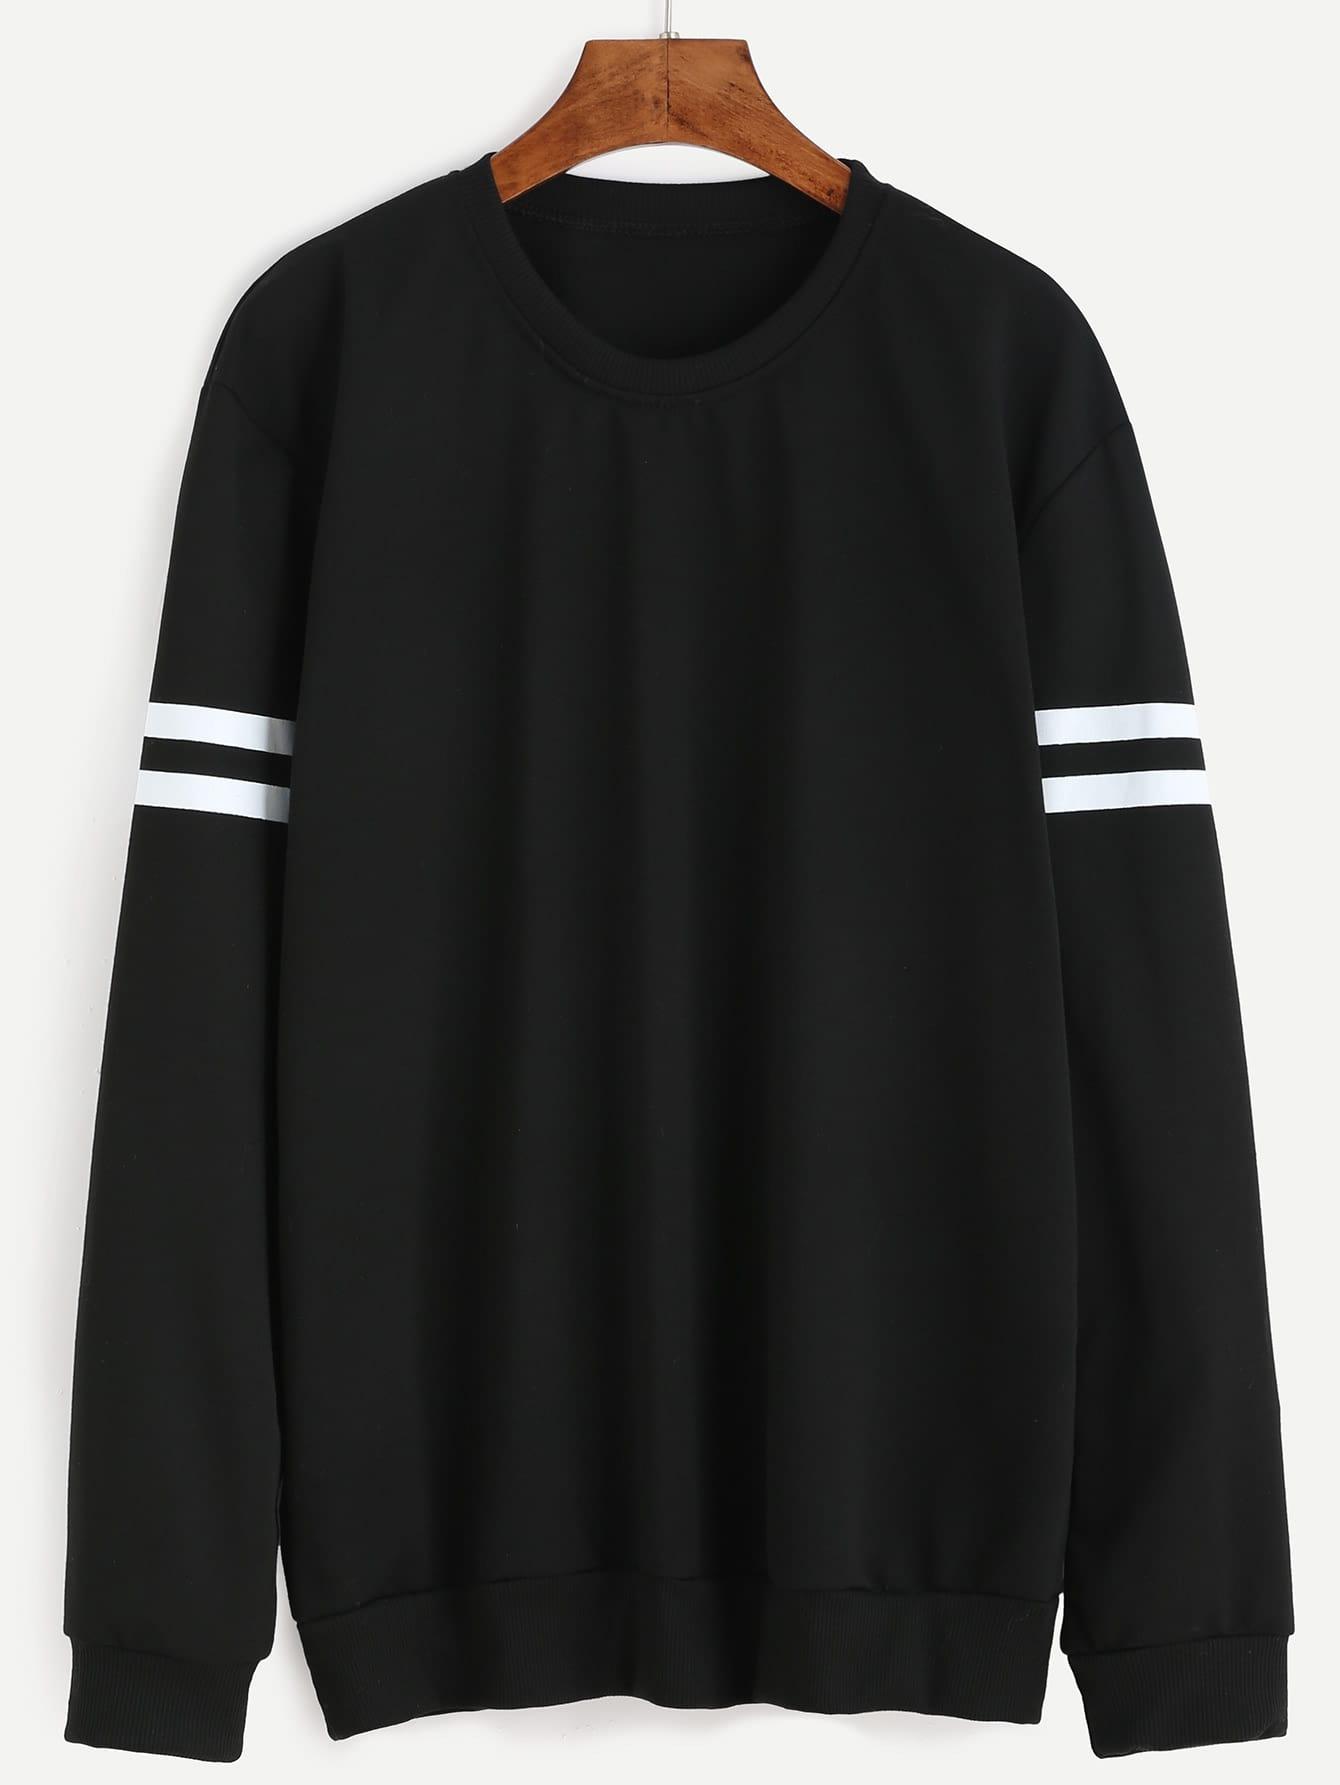 Black Varsity Striped Sweatshirt sweatshirt160804128